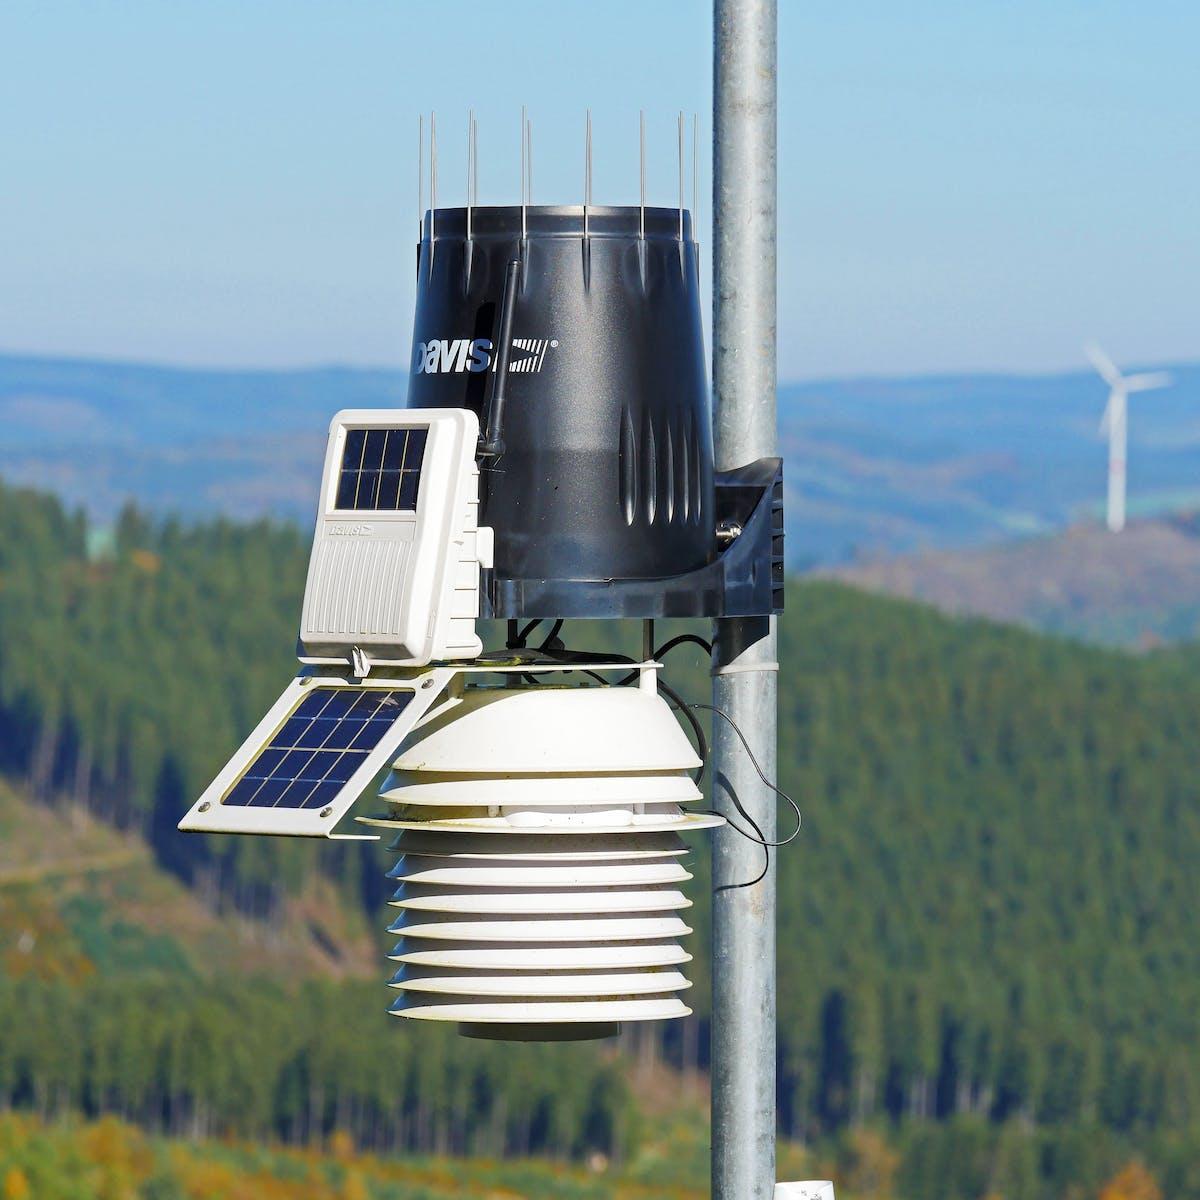 Titelbild-Messgerät-Luftmessung-Luftreinhaltung-Messstation-KI-Breeze-pixabay-2873935-hpgruesen